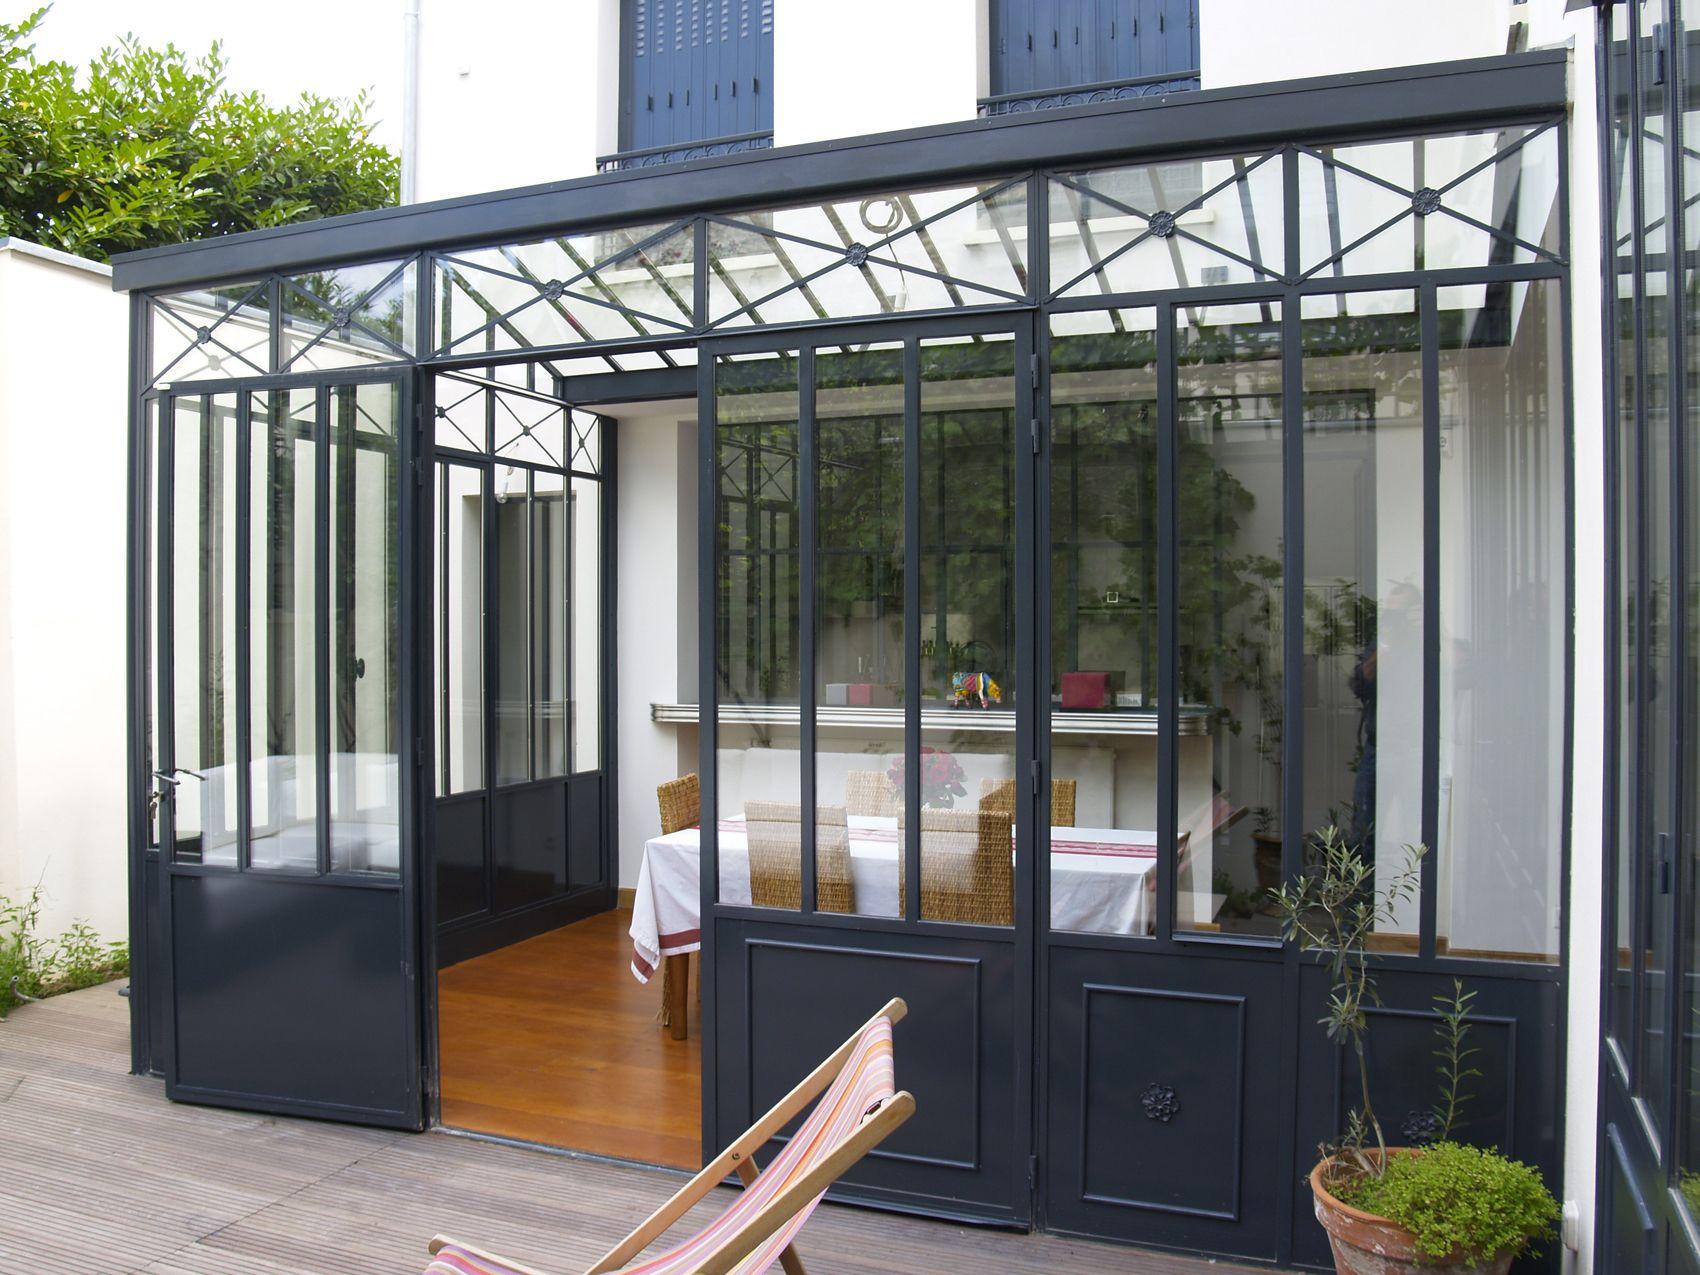 veranda type atelier d artiste netvani. Black Bedroom Furniture Sets. Home Design Ideas